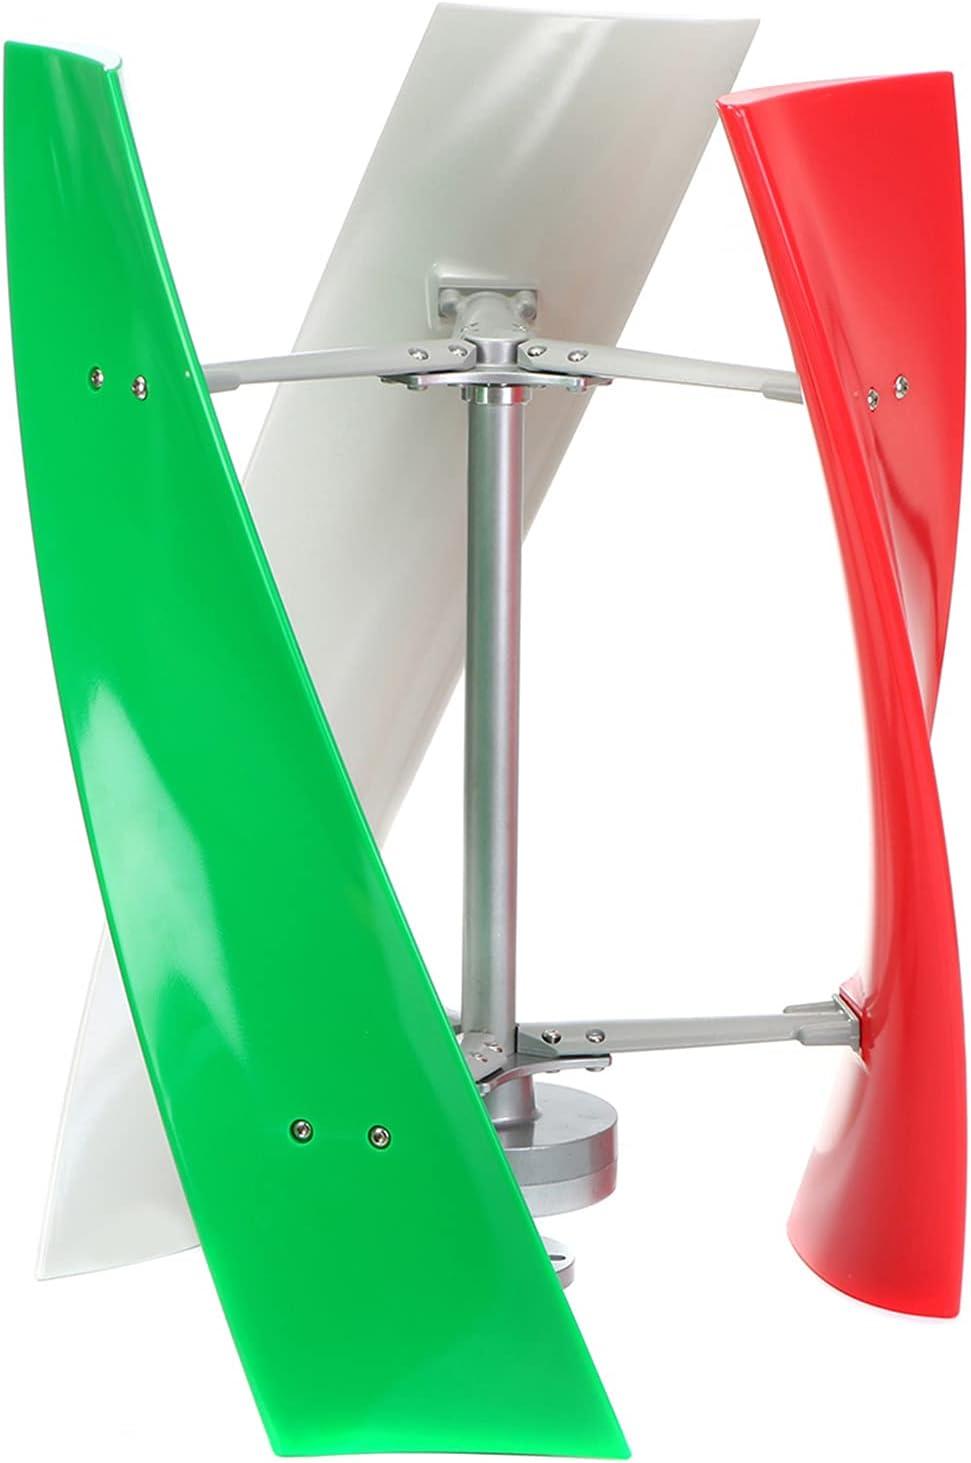 Boyuan Kit de generador de turbina de Viento, 12V / 24V / 48 Kit de generador de turbina de energía eólica de hélice Vertical portátil de 3 aspas, con Controlador de Carga